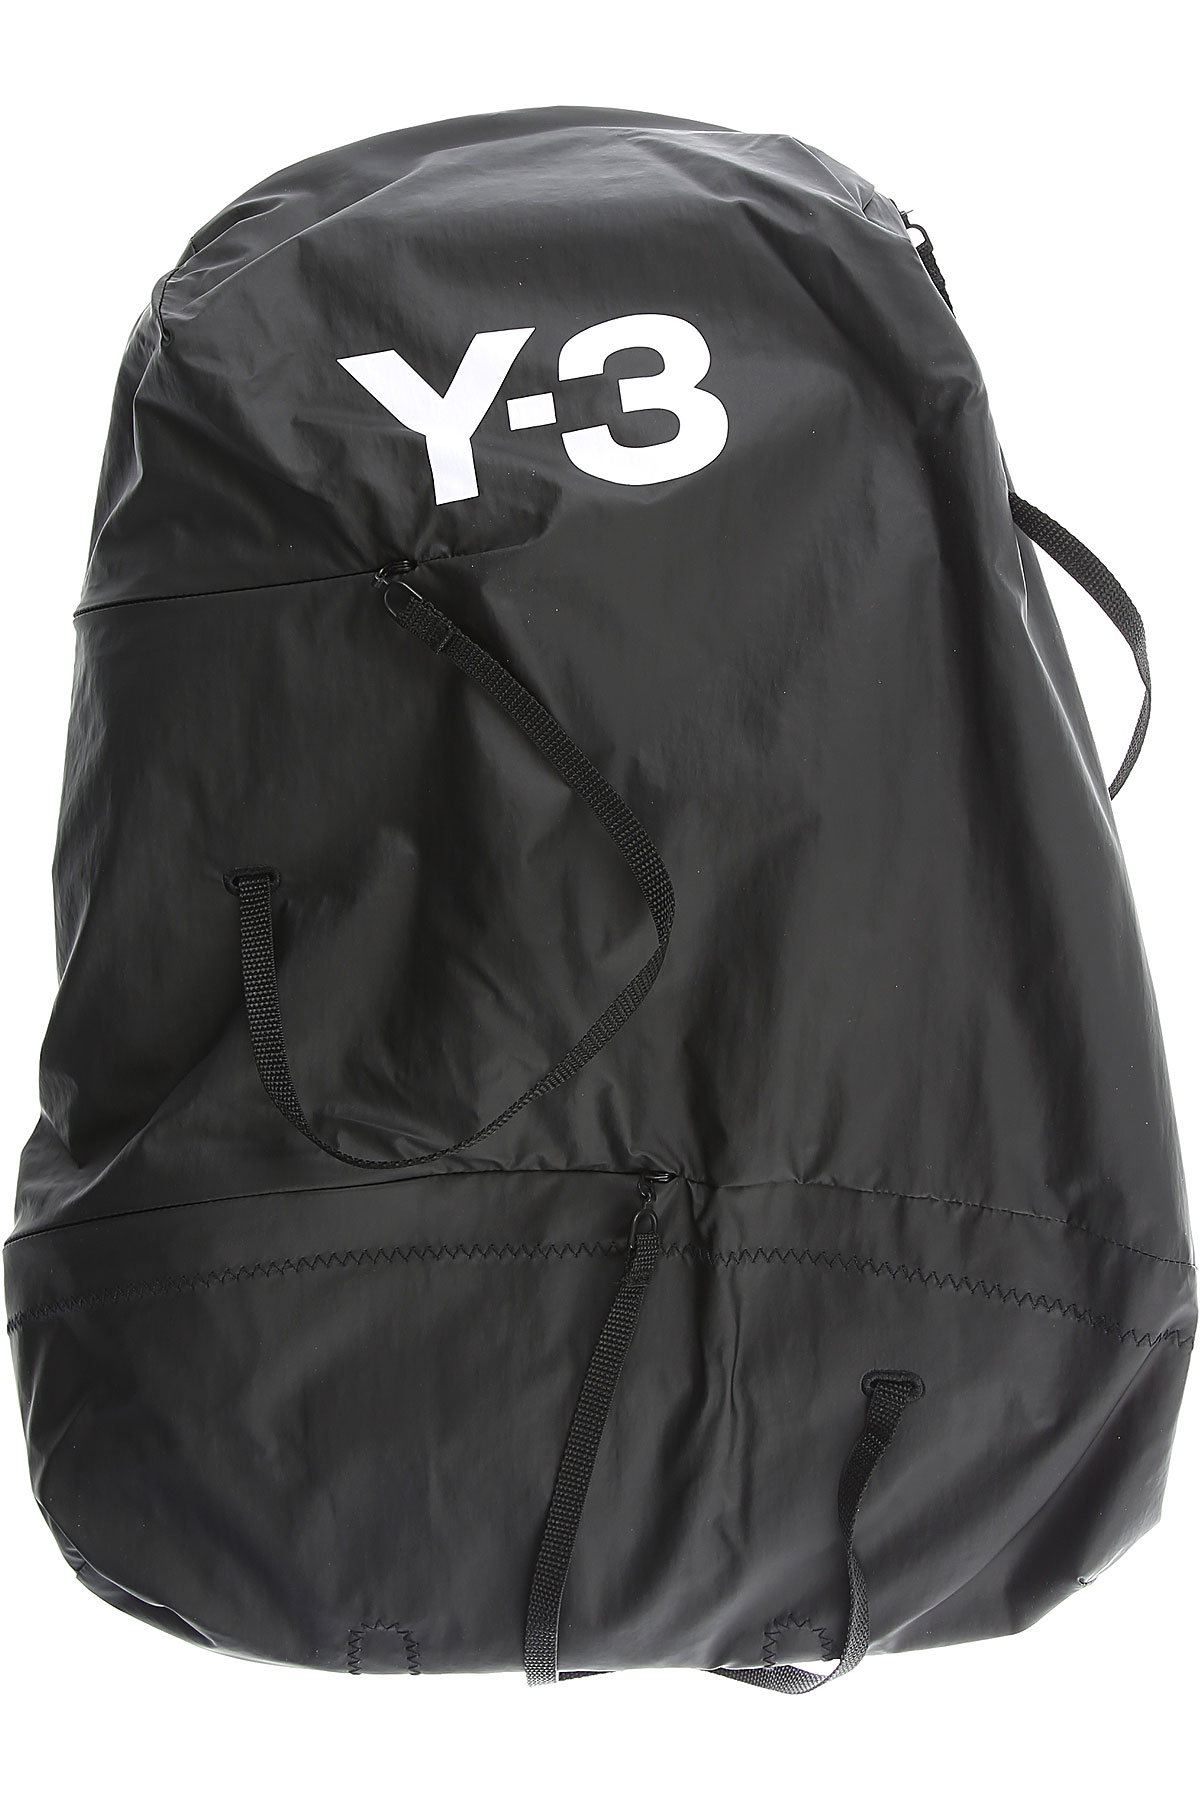 Y3 by Yohji Yamamoto Sac à Dos Homme, Noir, Nylon, 2017